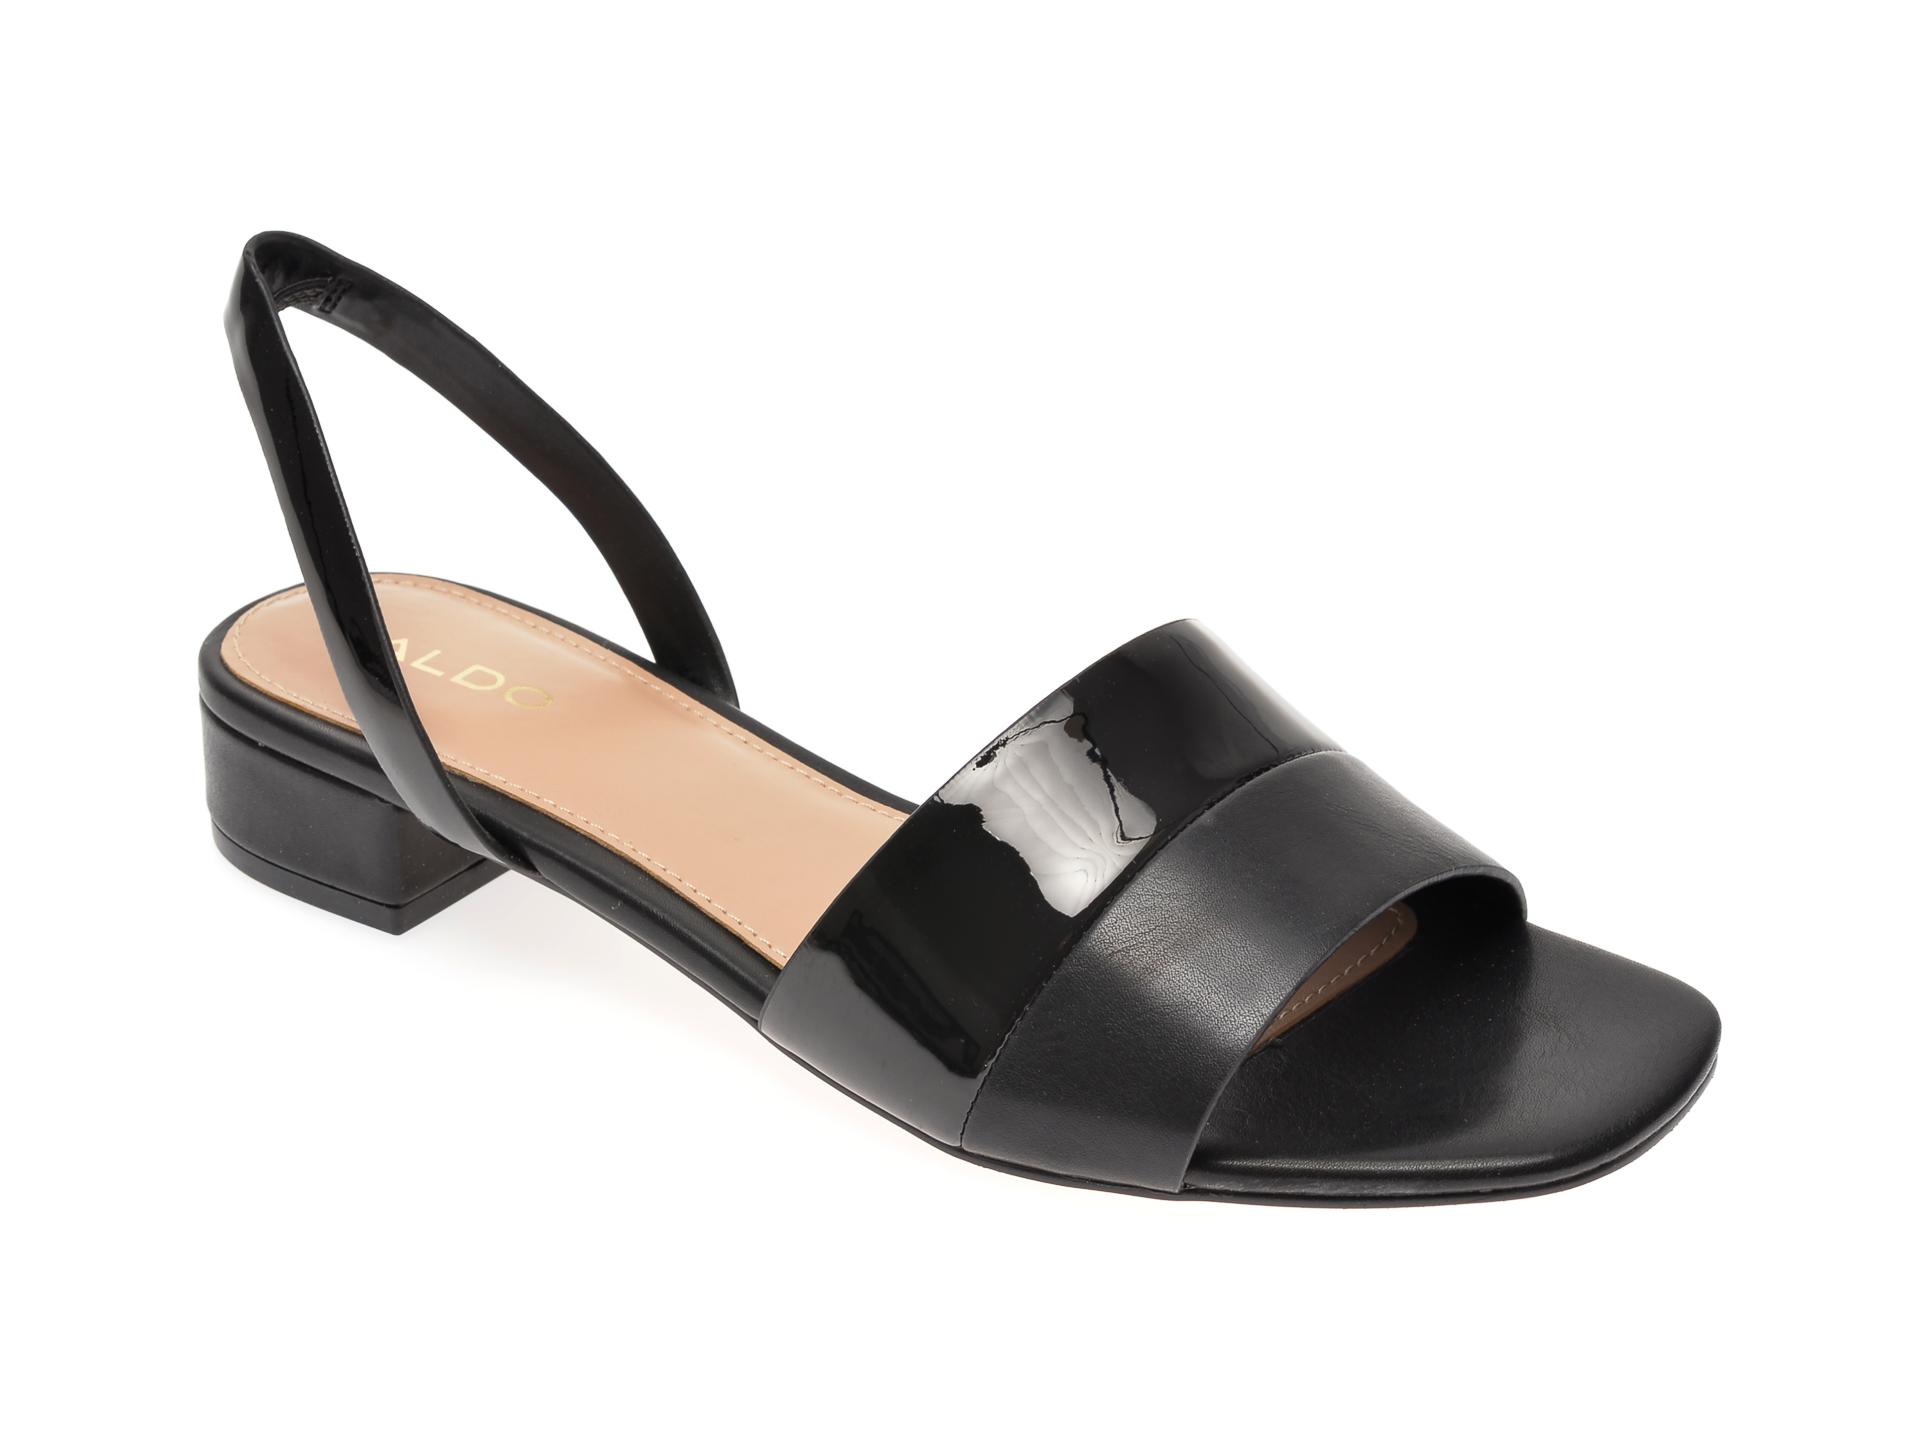 Sandale ALDO negre, Candy001, din piele ecologica imagine otter.ro 2021